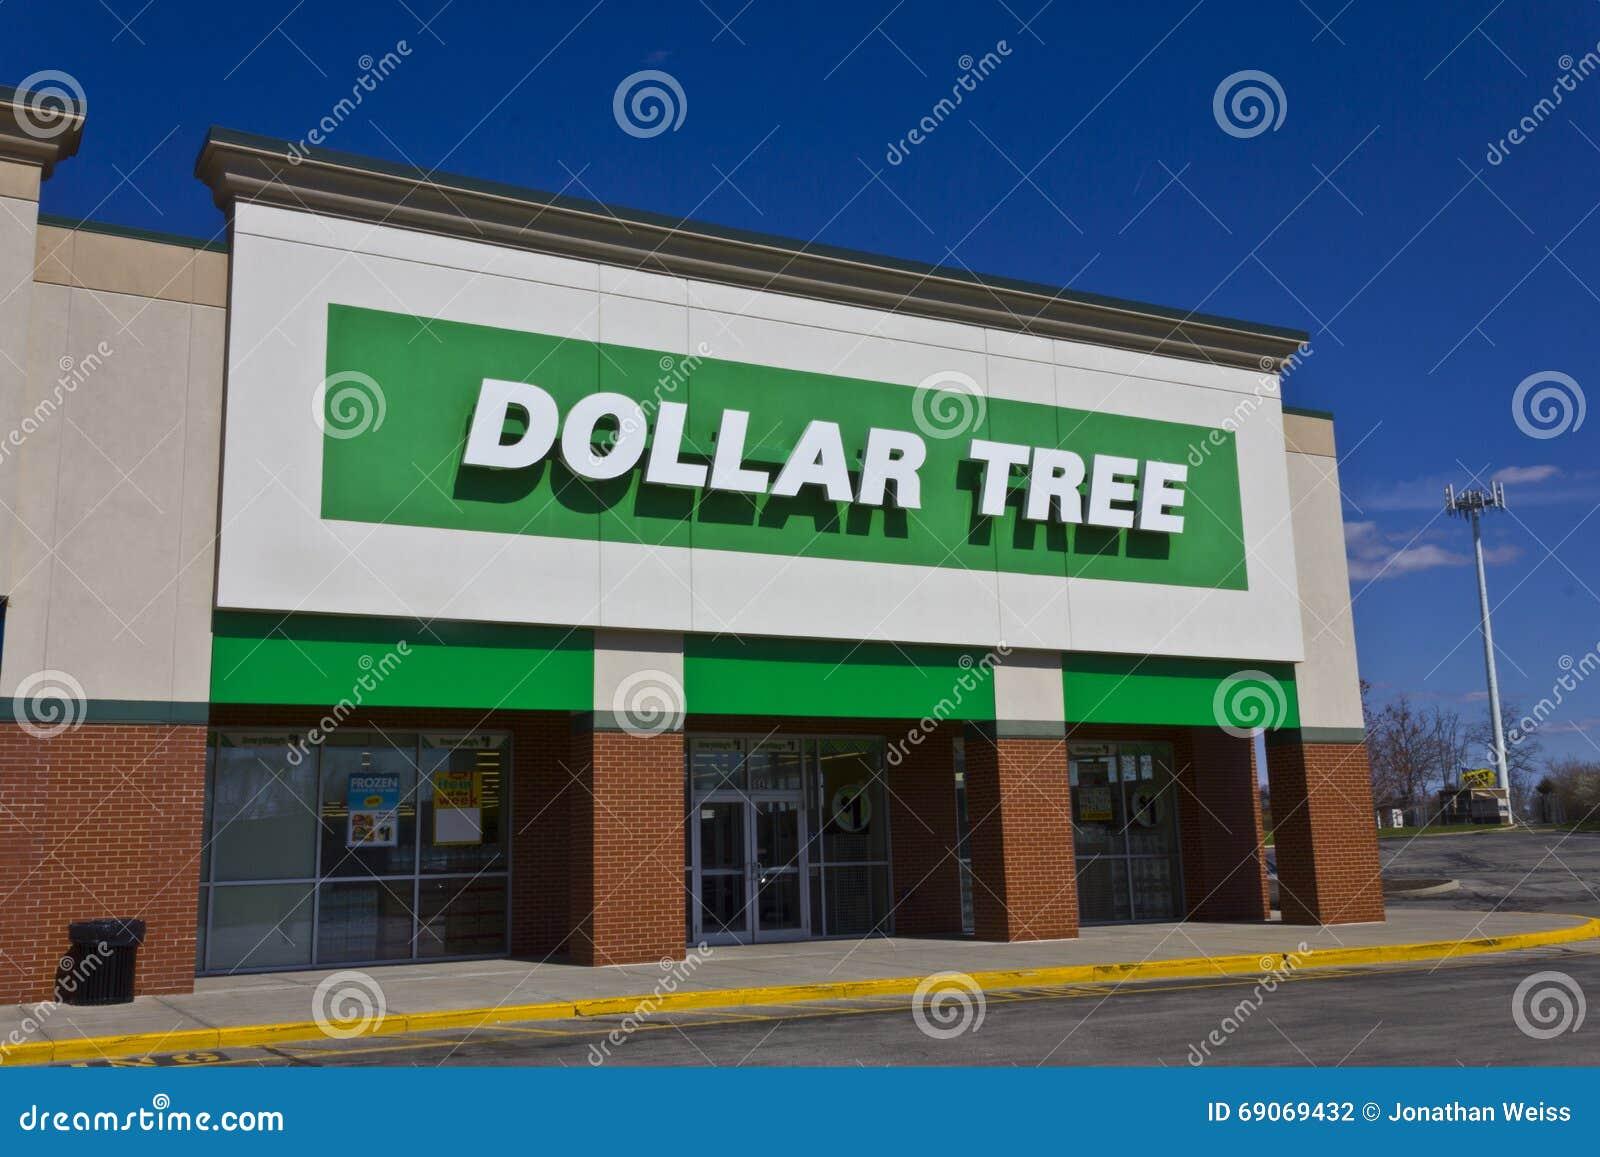 Indianapolis - Circa March 2016: Dollar Tree Discount Store I